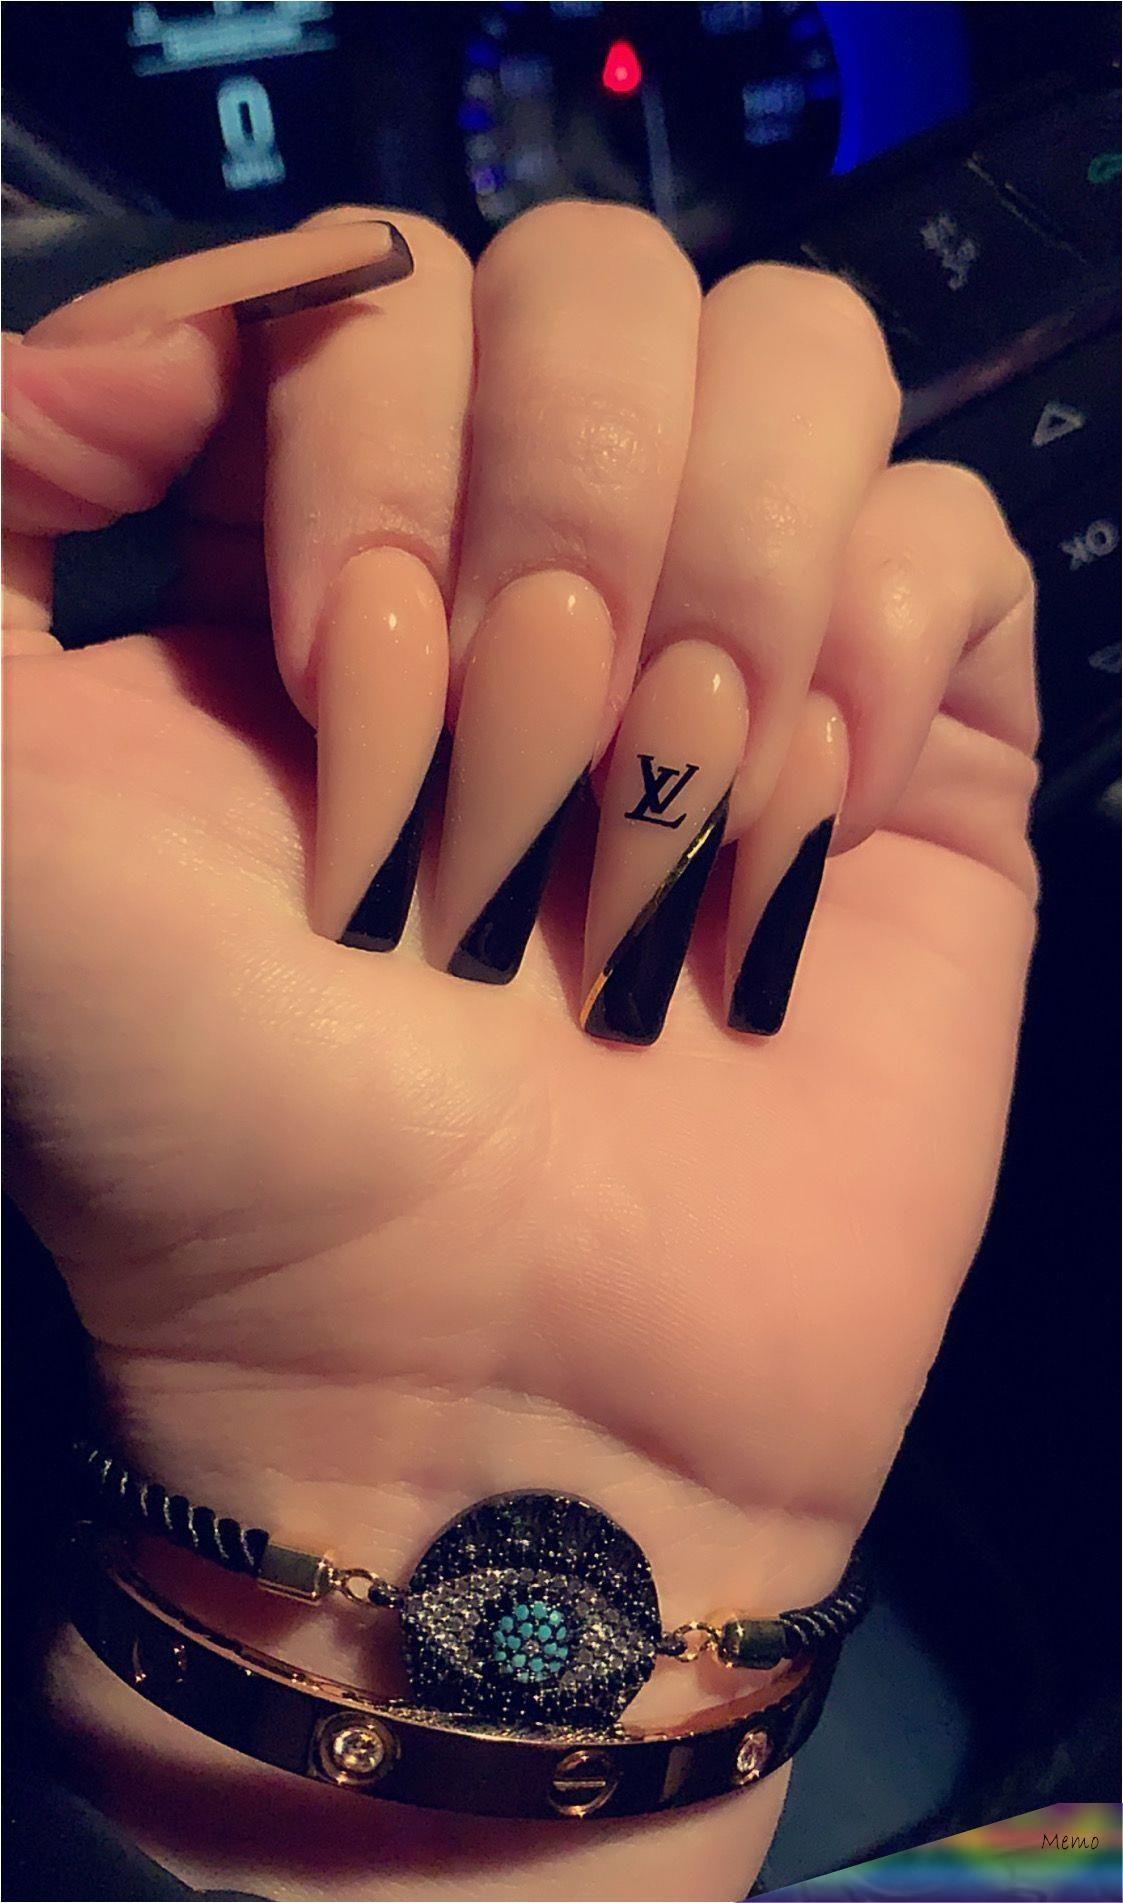 25-dic-2019 - Long coffin nails Louis Vuitton nails corner painted nails black n